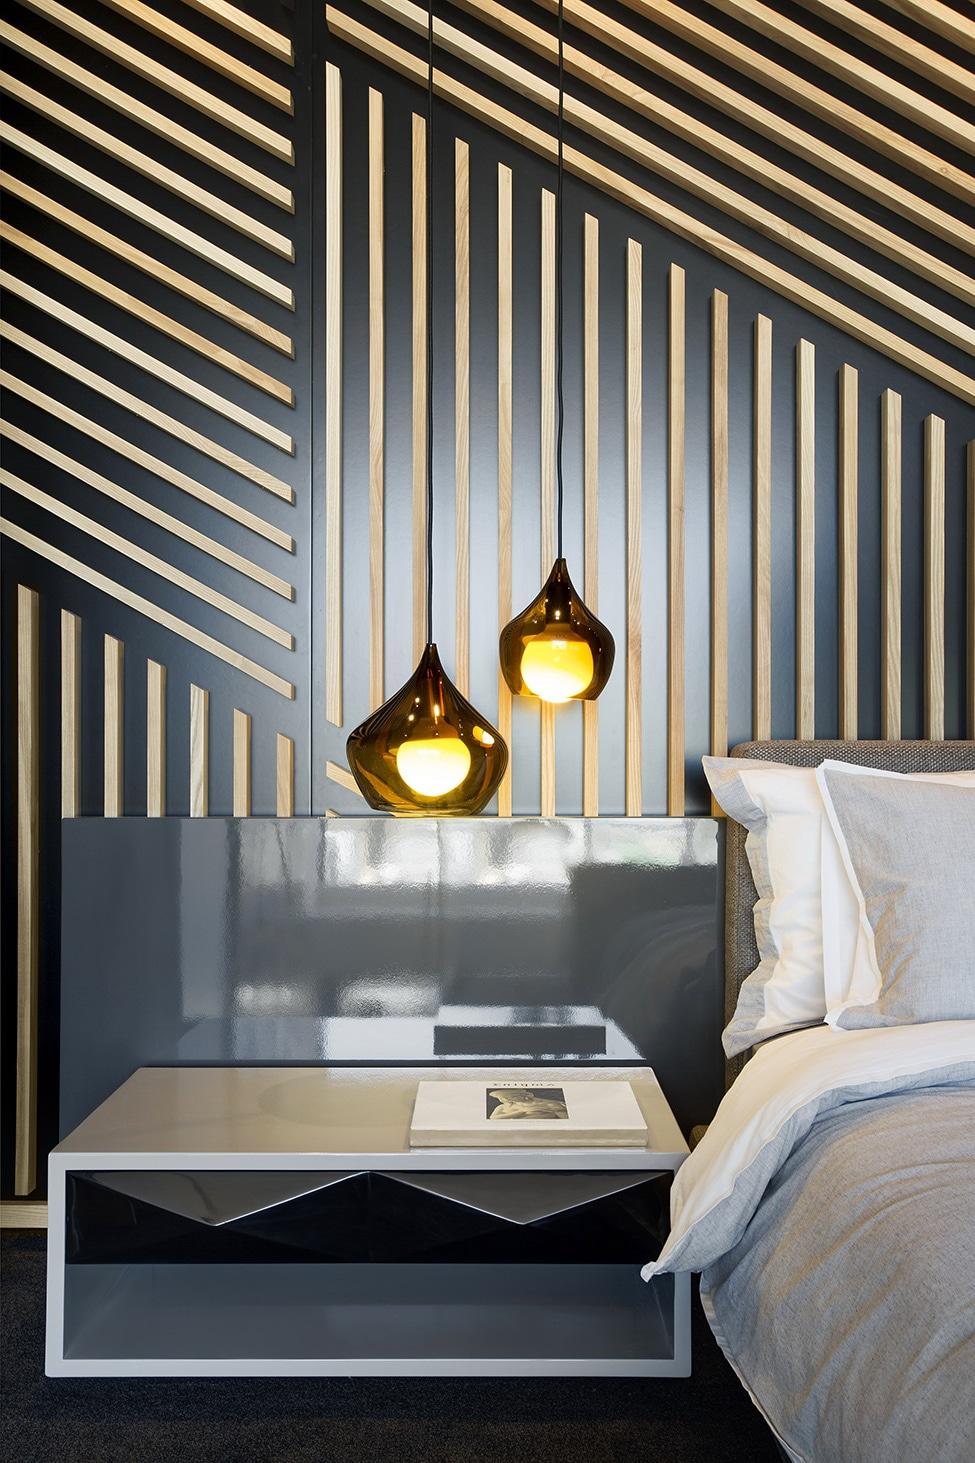 Dise o de minidepartamento moderno interiores elegante for Construye hogar